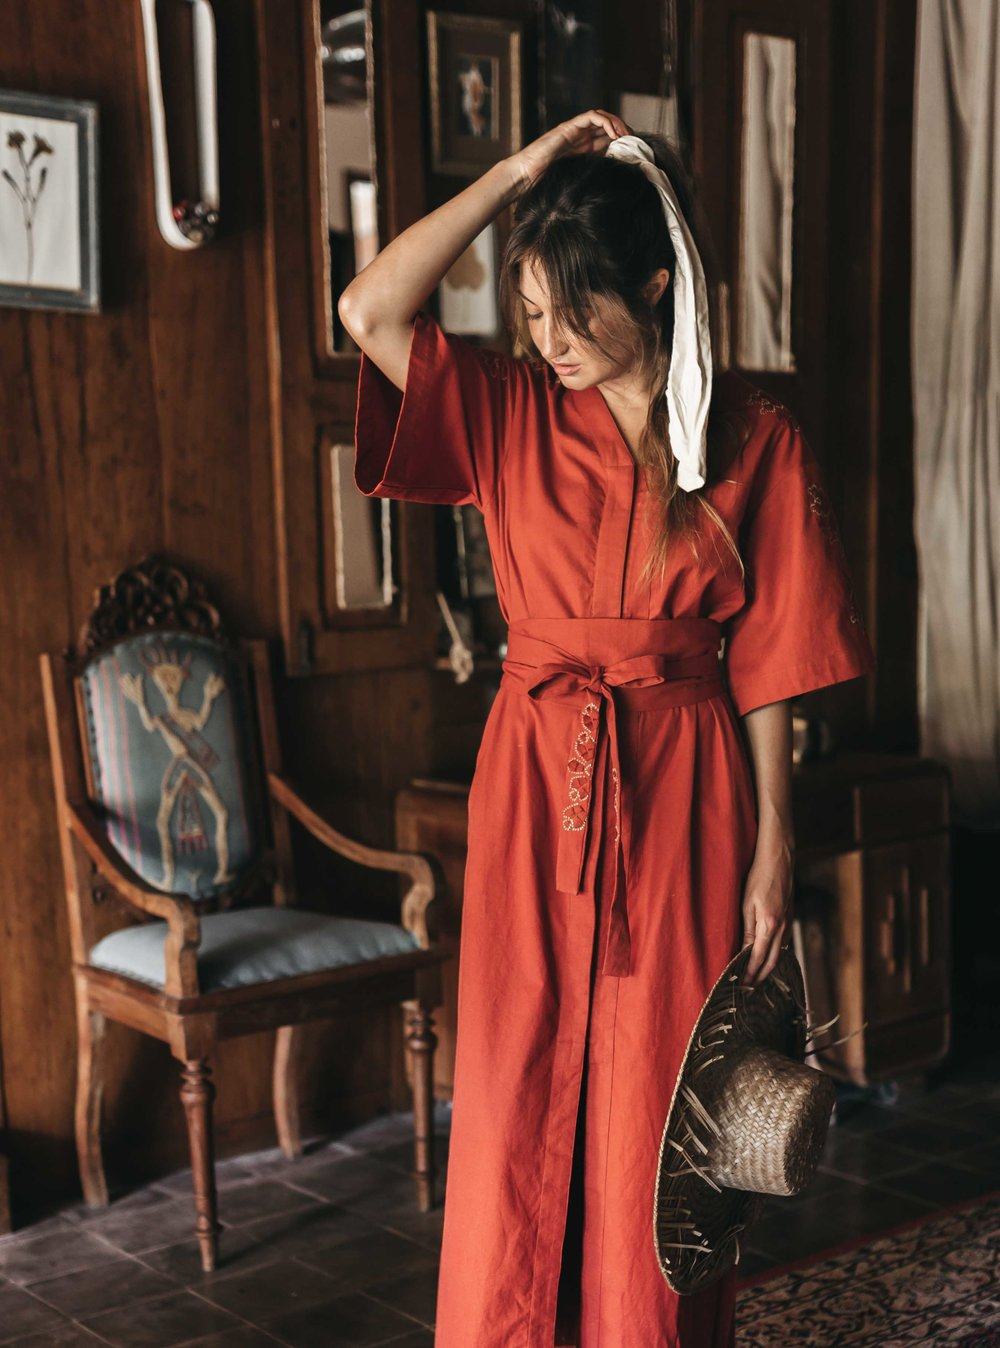 Keira-Mason-Matter-Prints-fashion photography.jpg